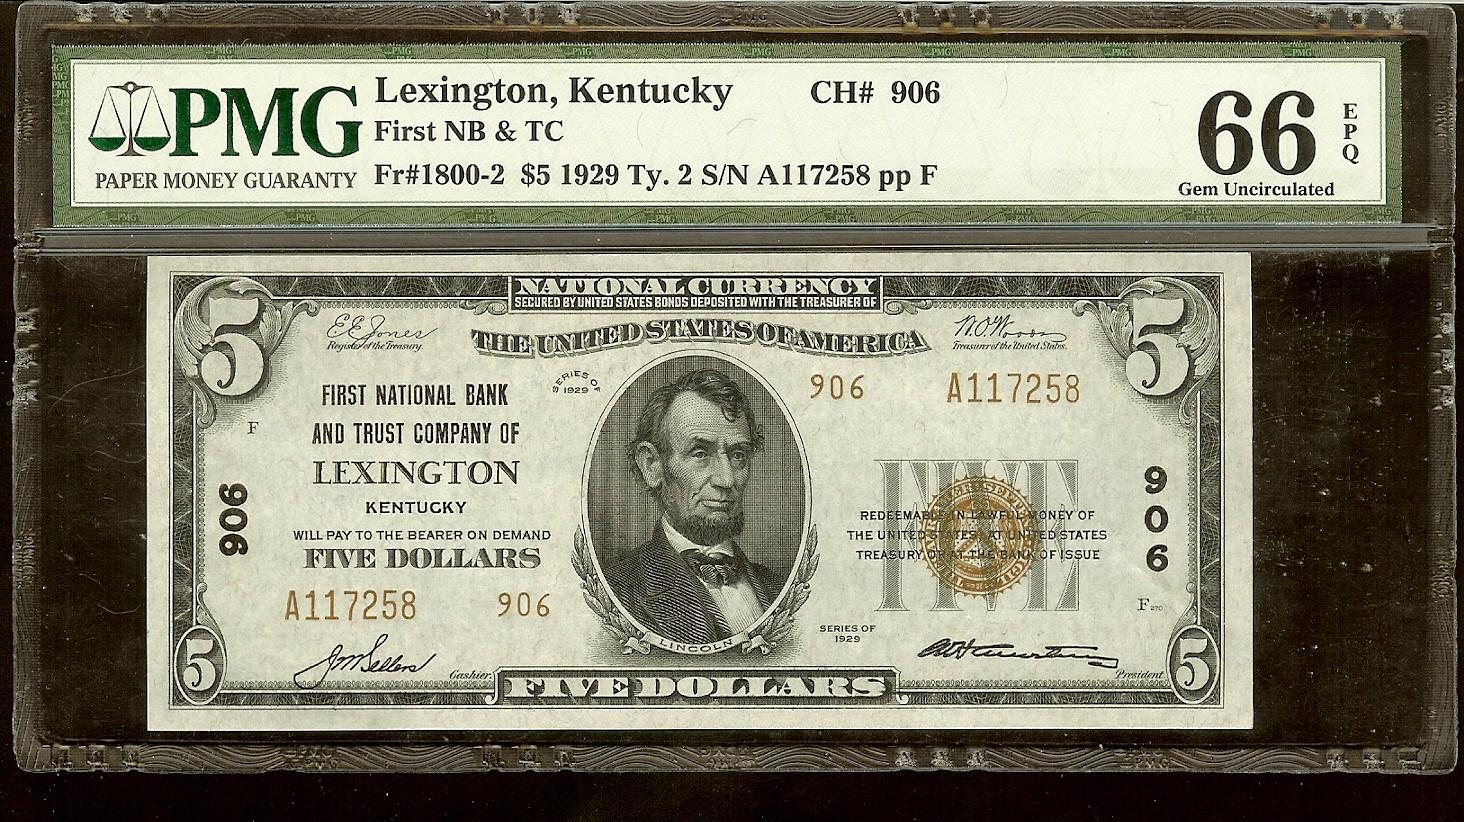 Click image for larger version - Name: 5 1929 NC Lexington N66 OBV 90 orig.jpg, Views: 152, Size: 513.25 KB